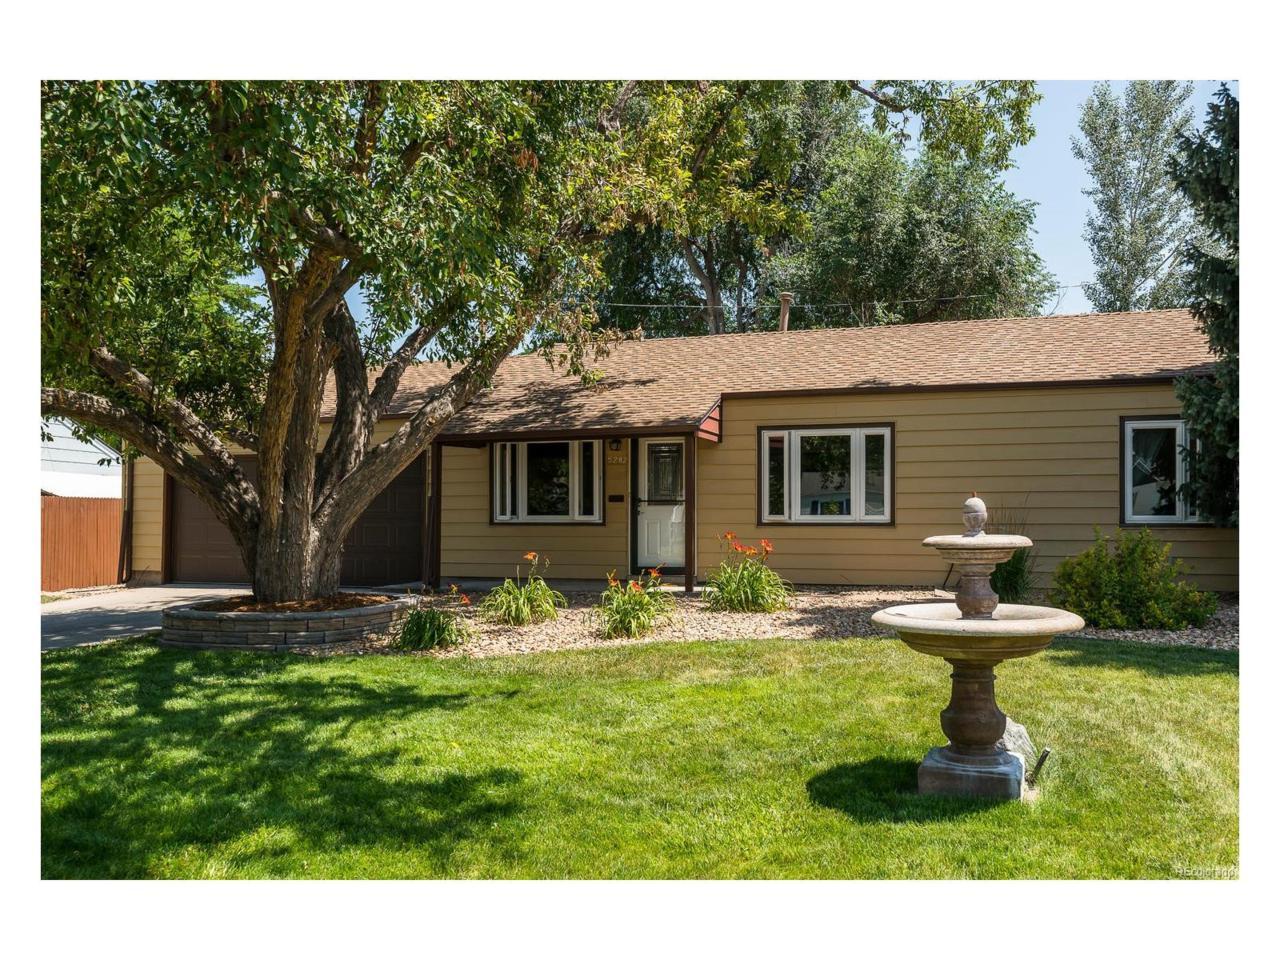 5282 E Dartmouth Avenue, Denver, CO 80222 (MLS #8230193) :: 8z Real Estate